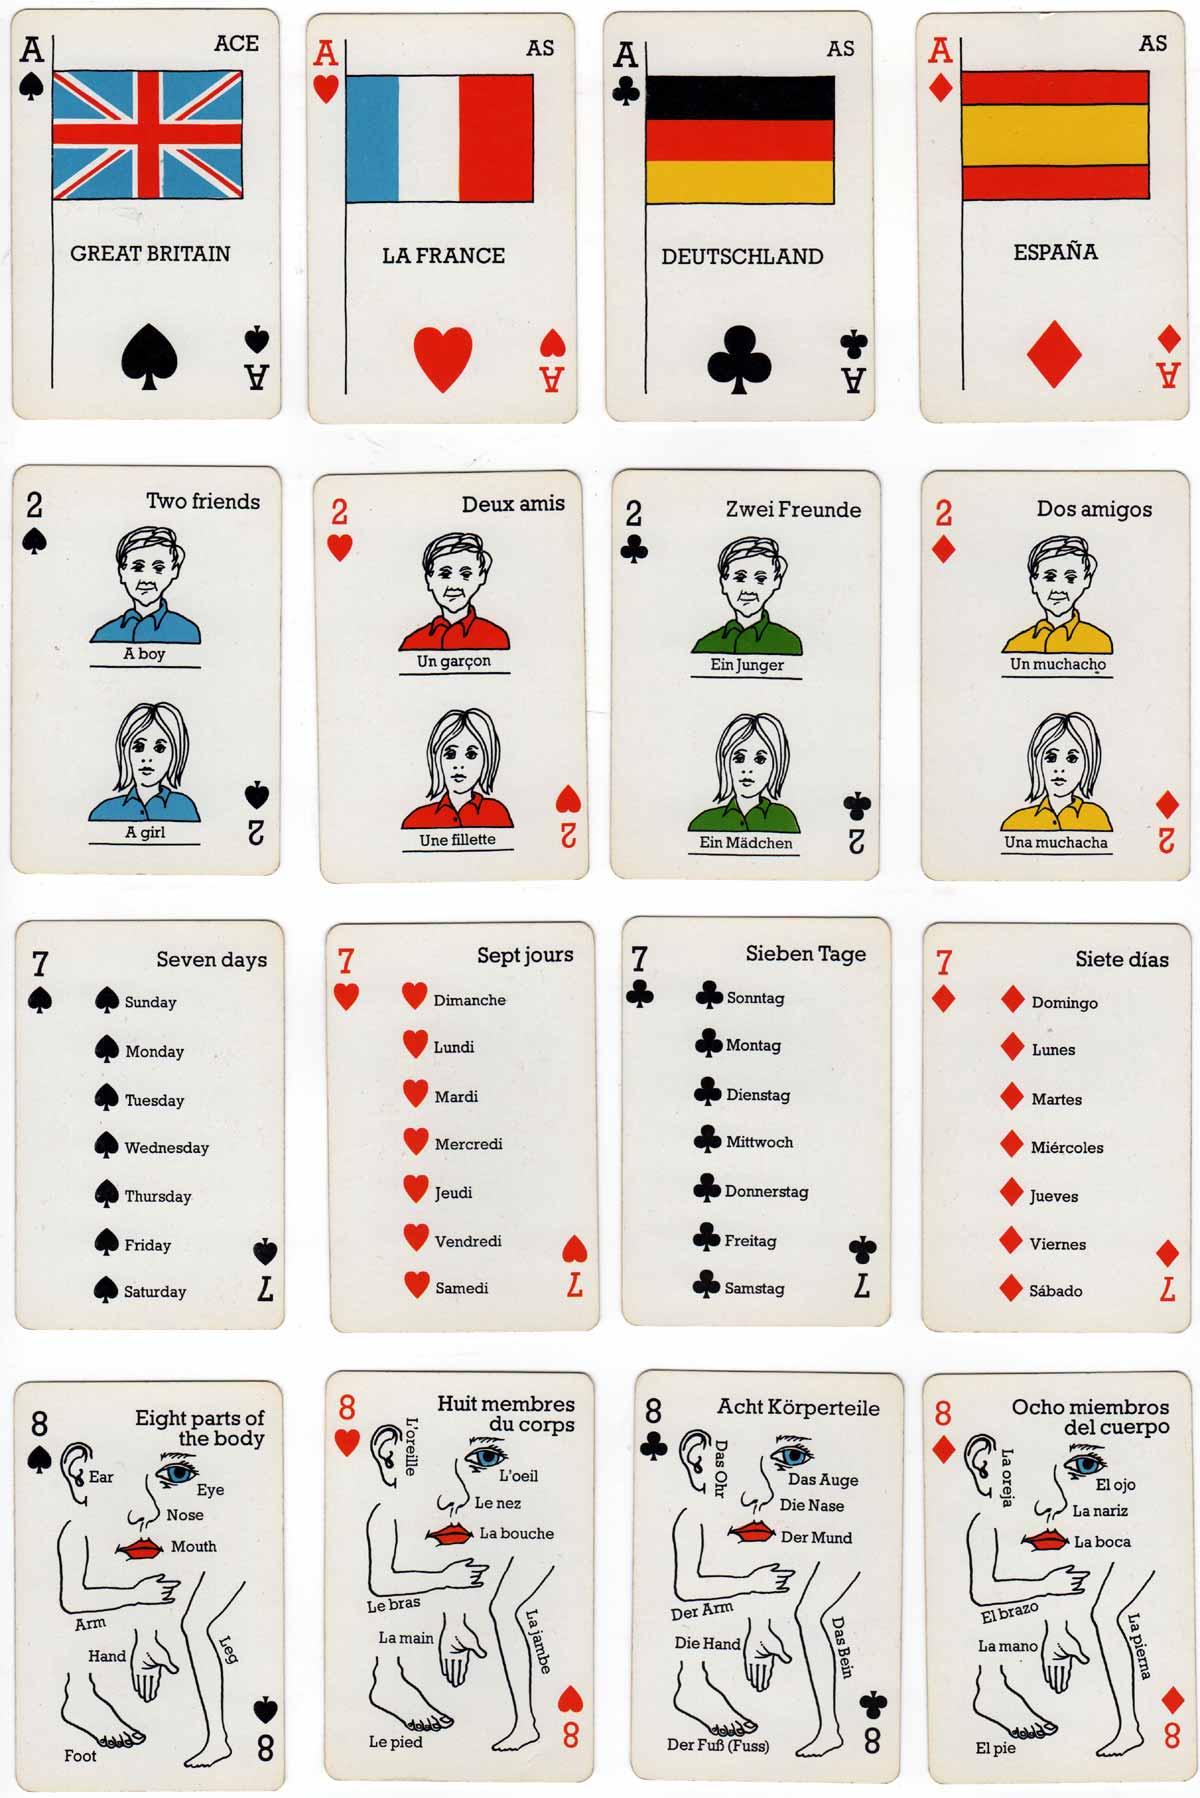 Desperanto language game by Qui Vive Ltd, c.1990